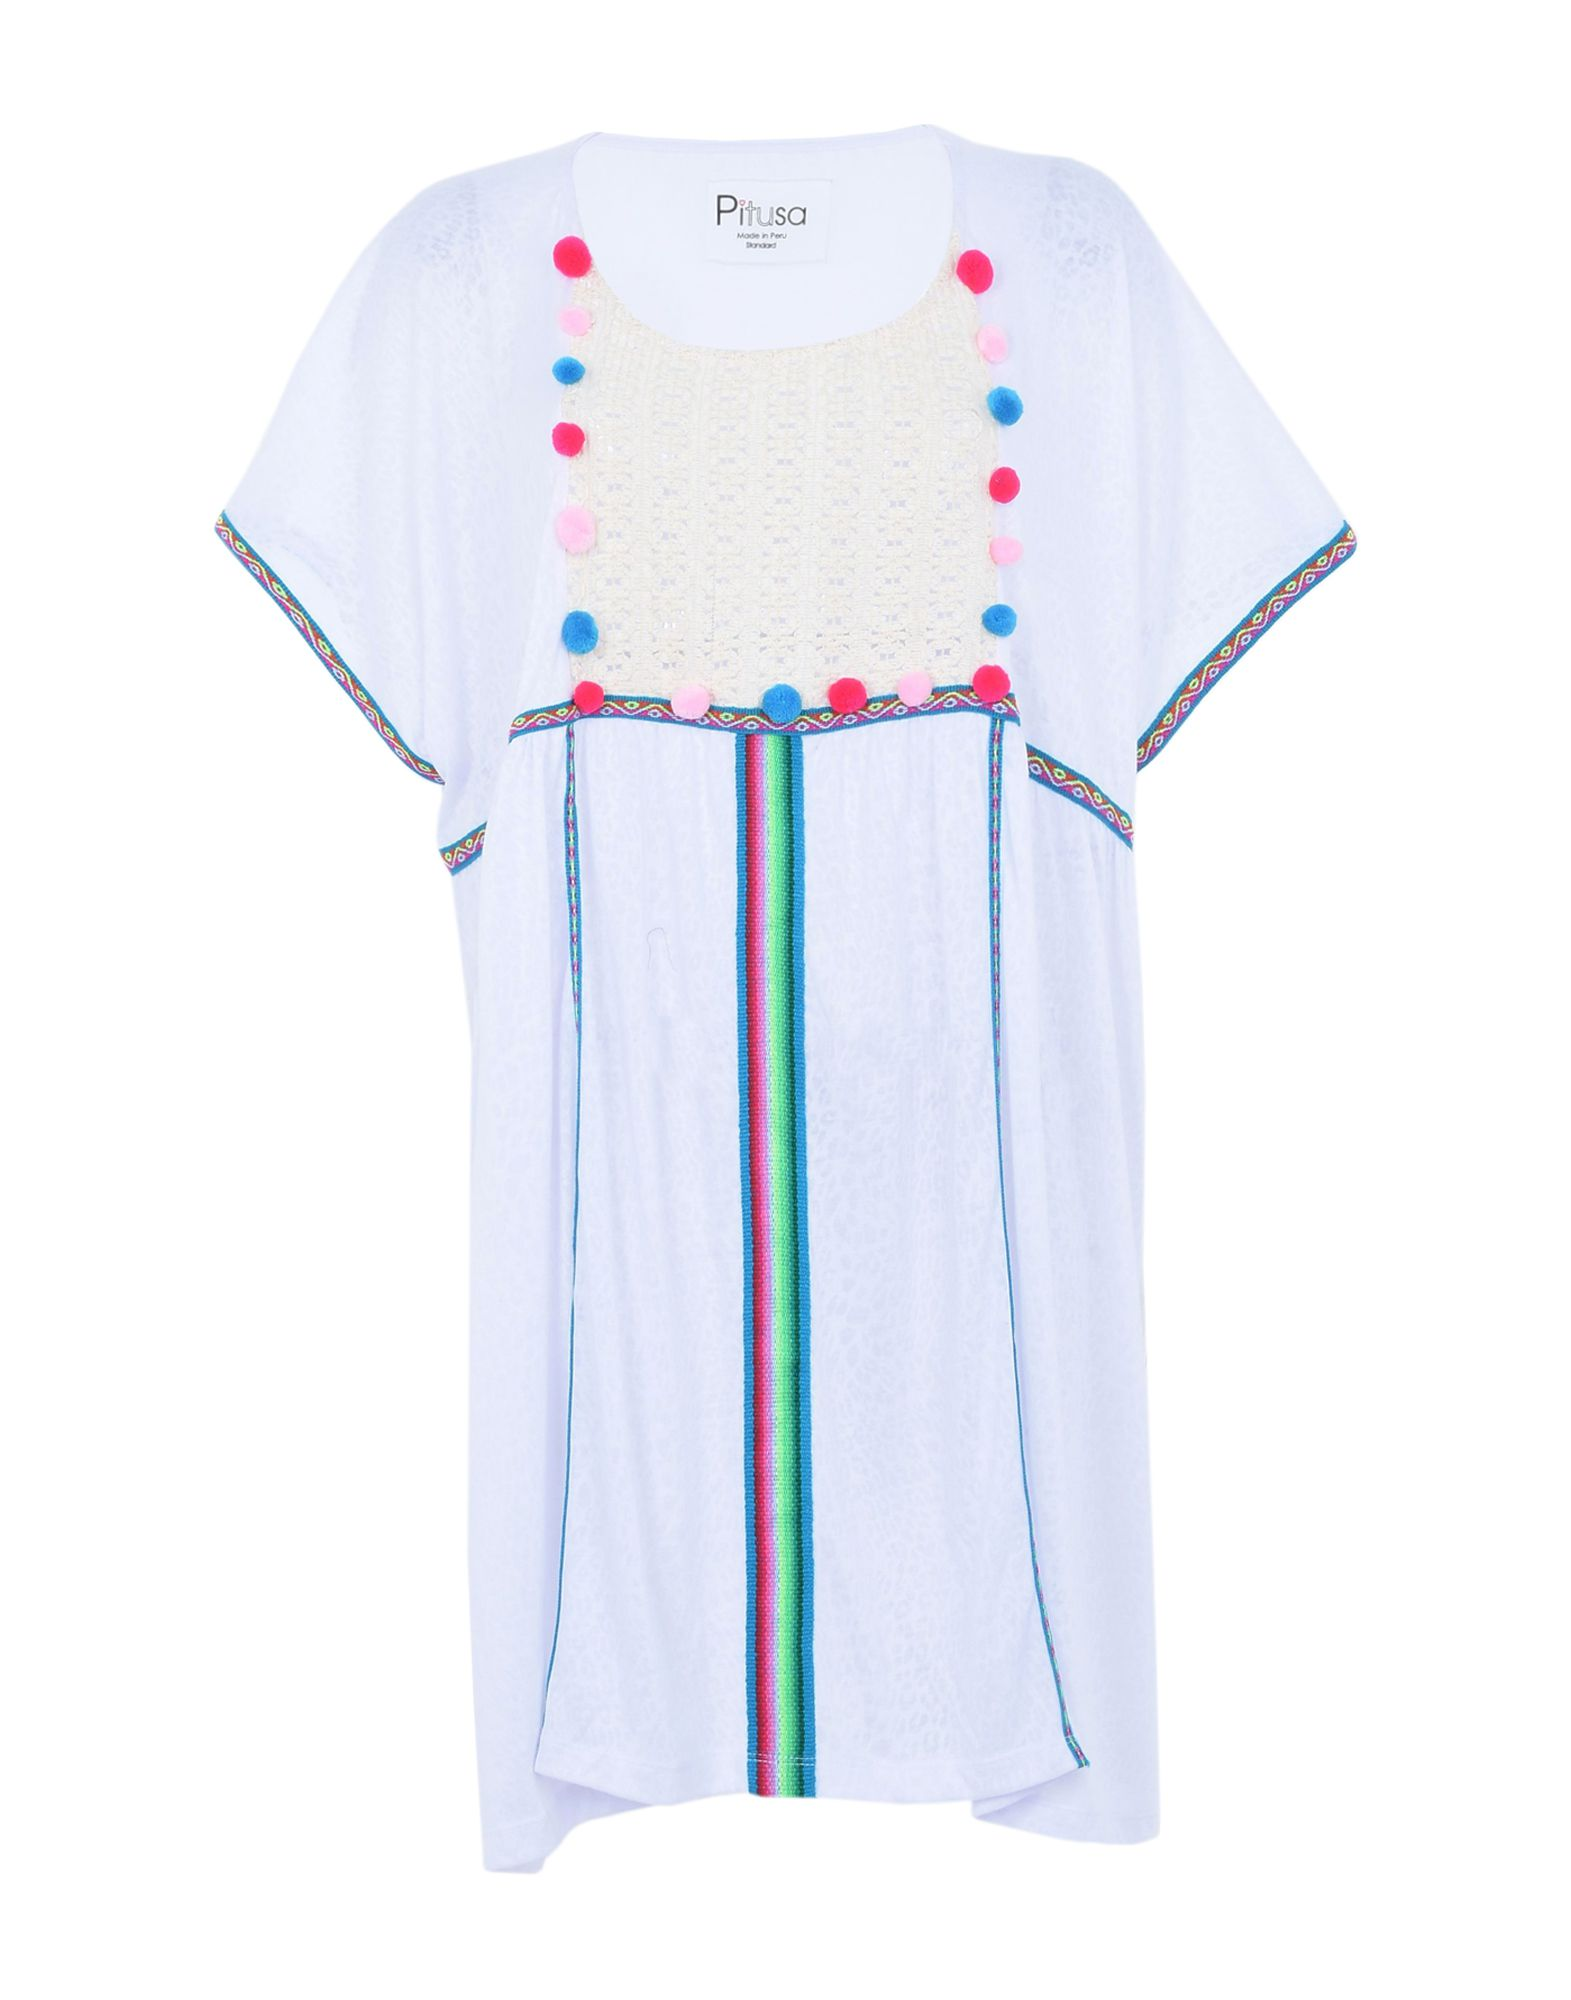 Copricostume Pitusa Butterfly Dress - Donna - Acquista online su sIO6Rv4Gh